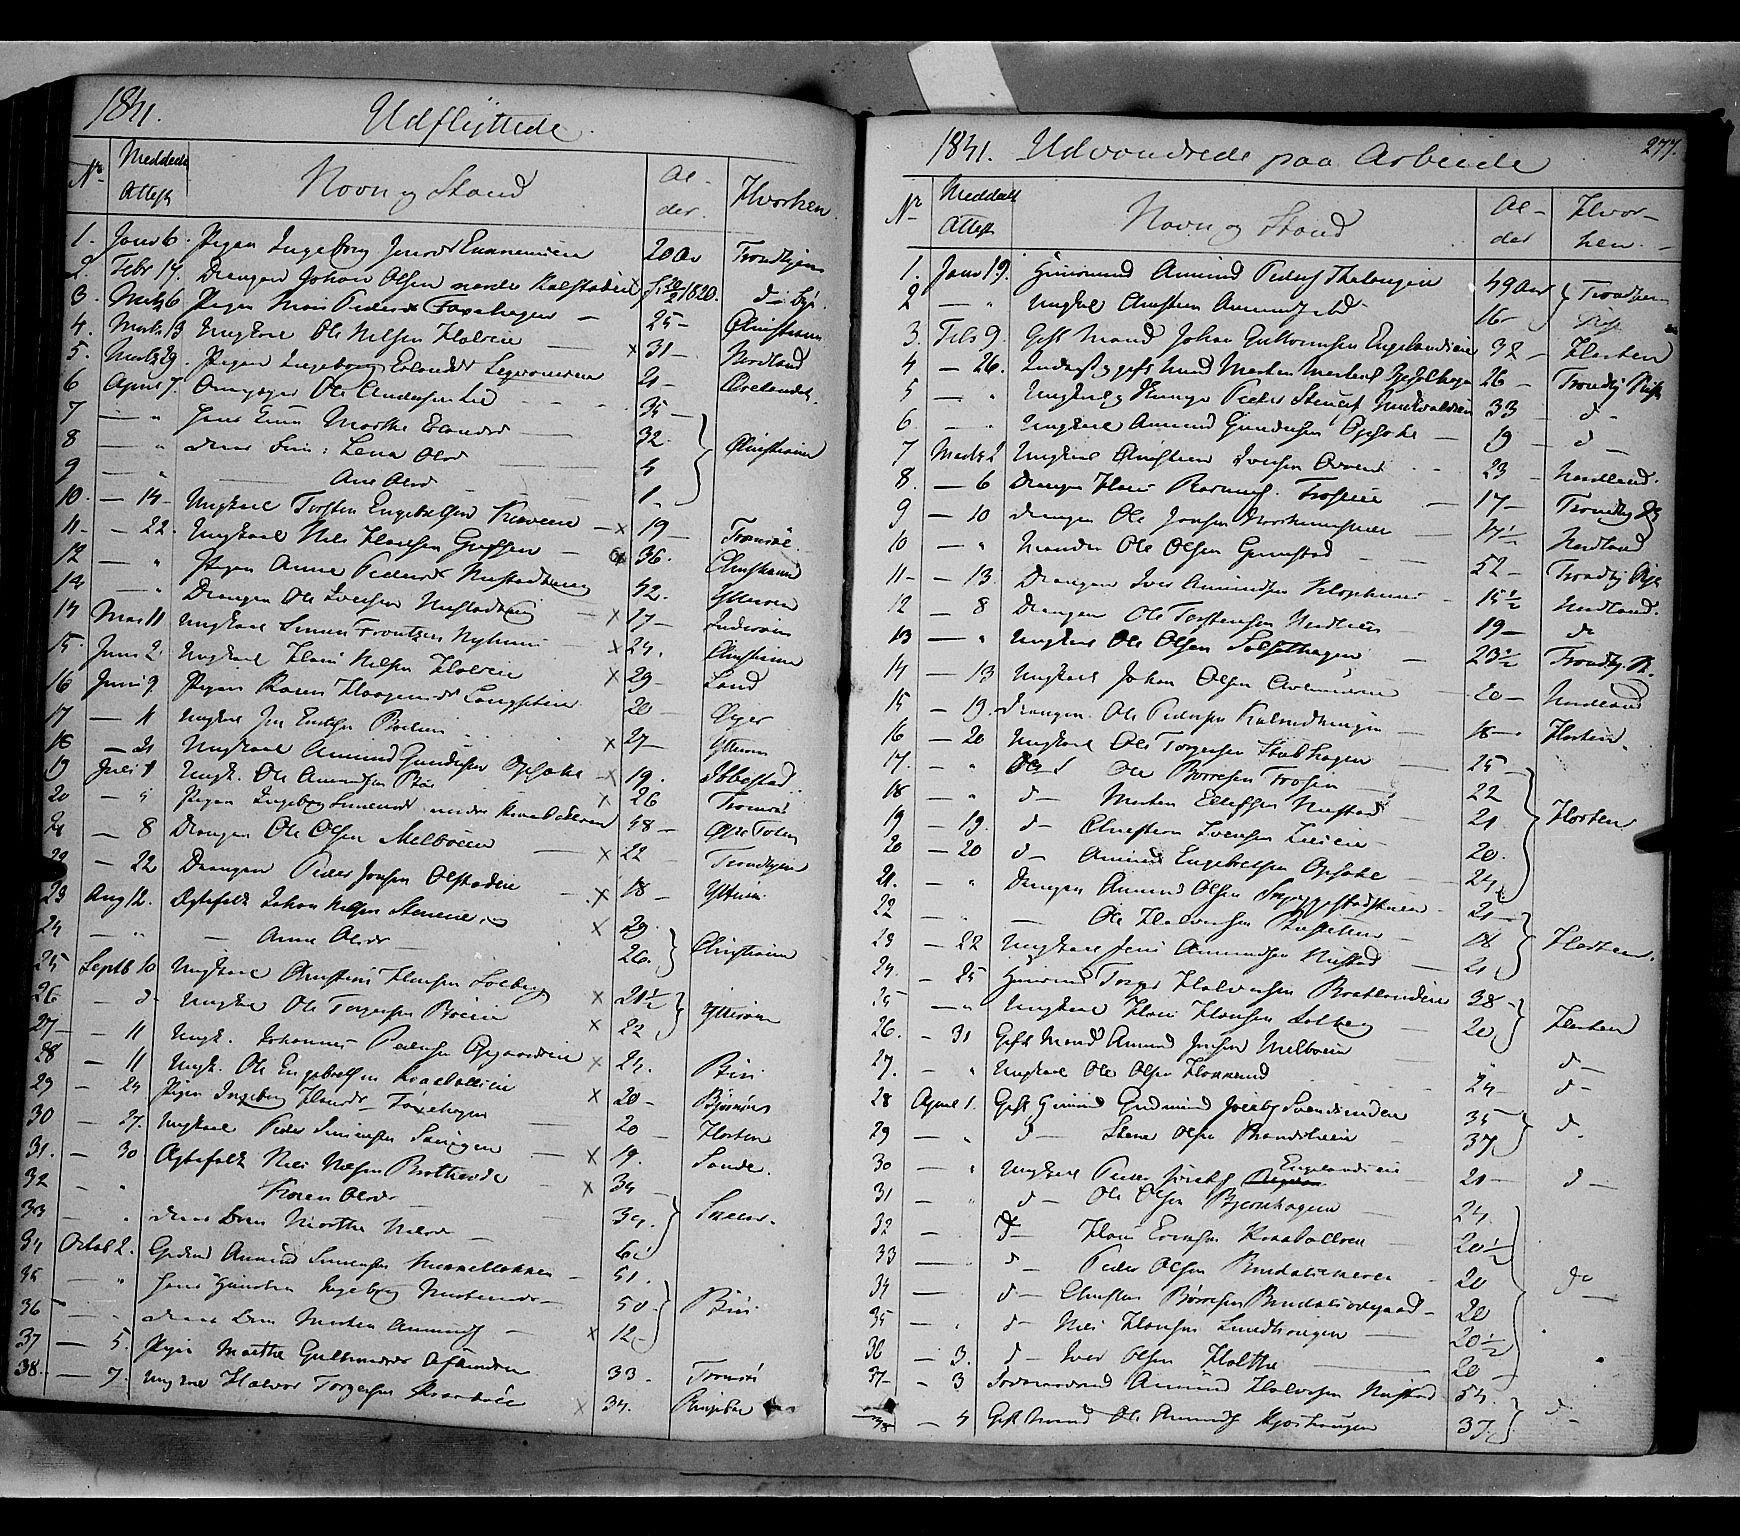 SAH, Gausdal prestekontor, Ministerialbok nr. 7, 1840-1850, s. 277